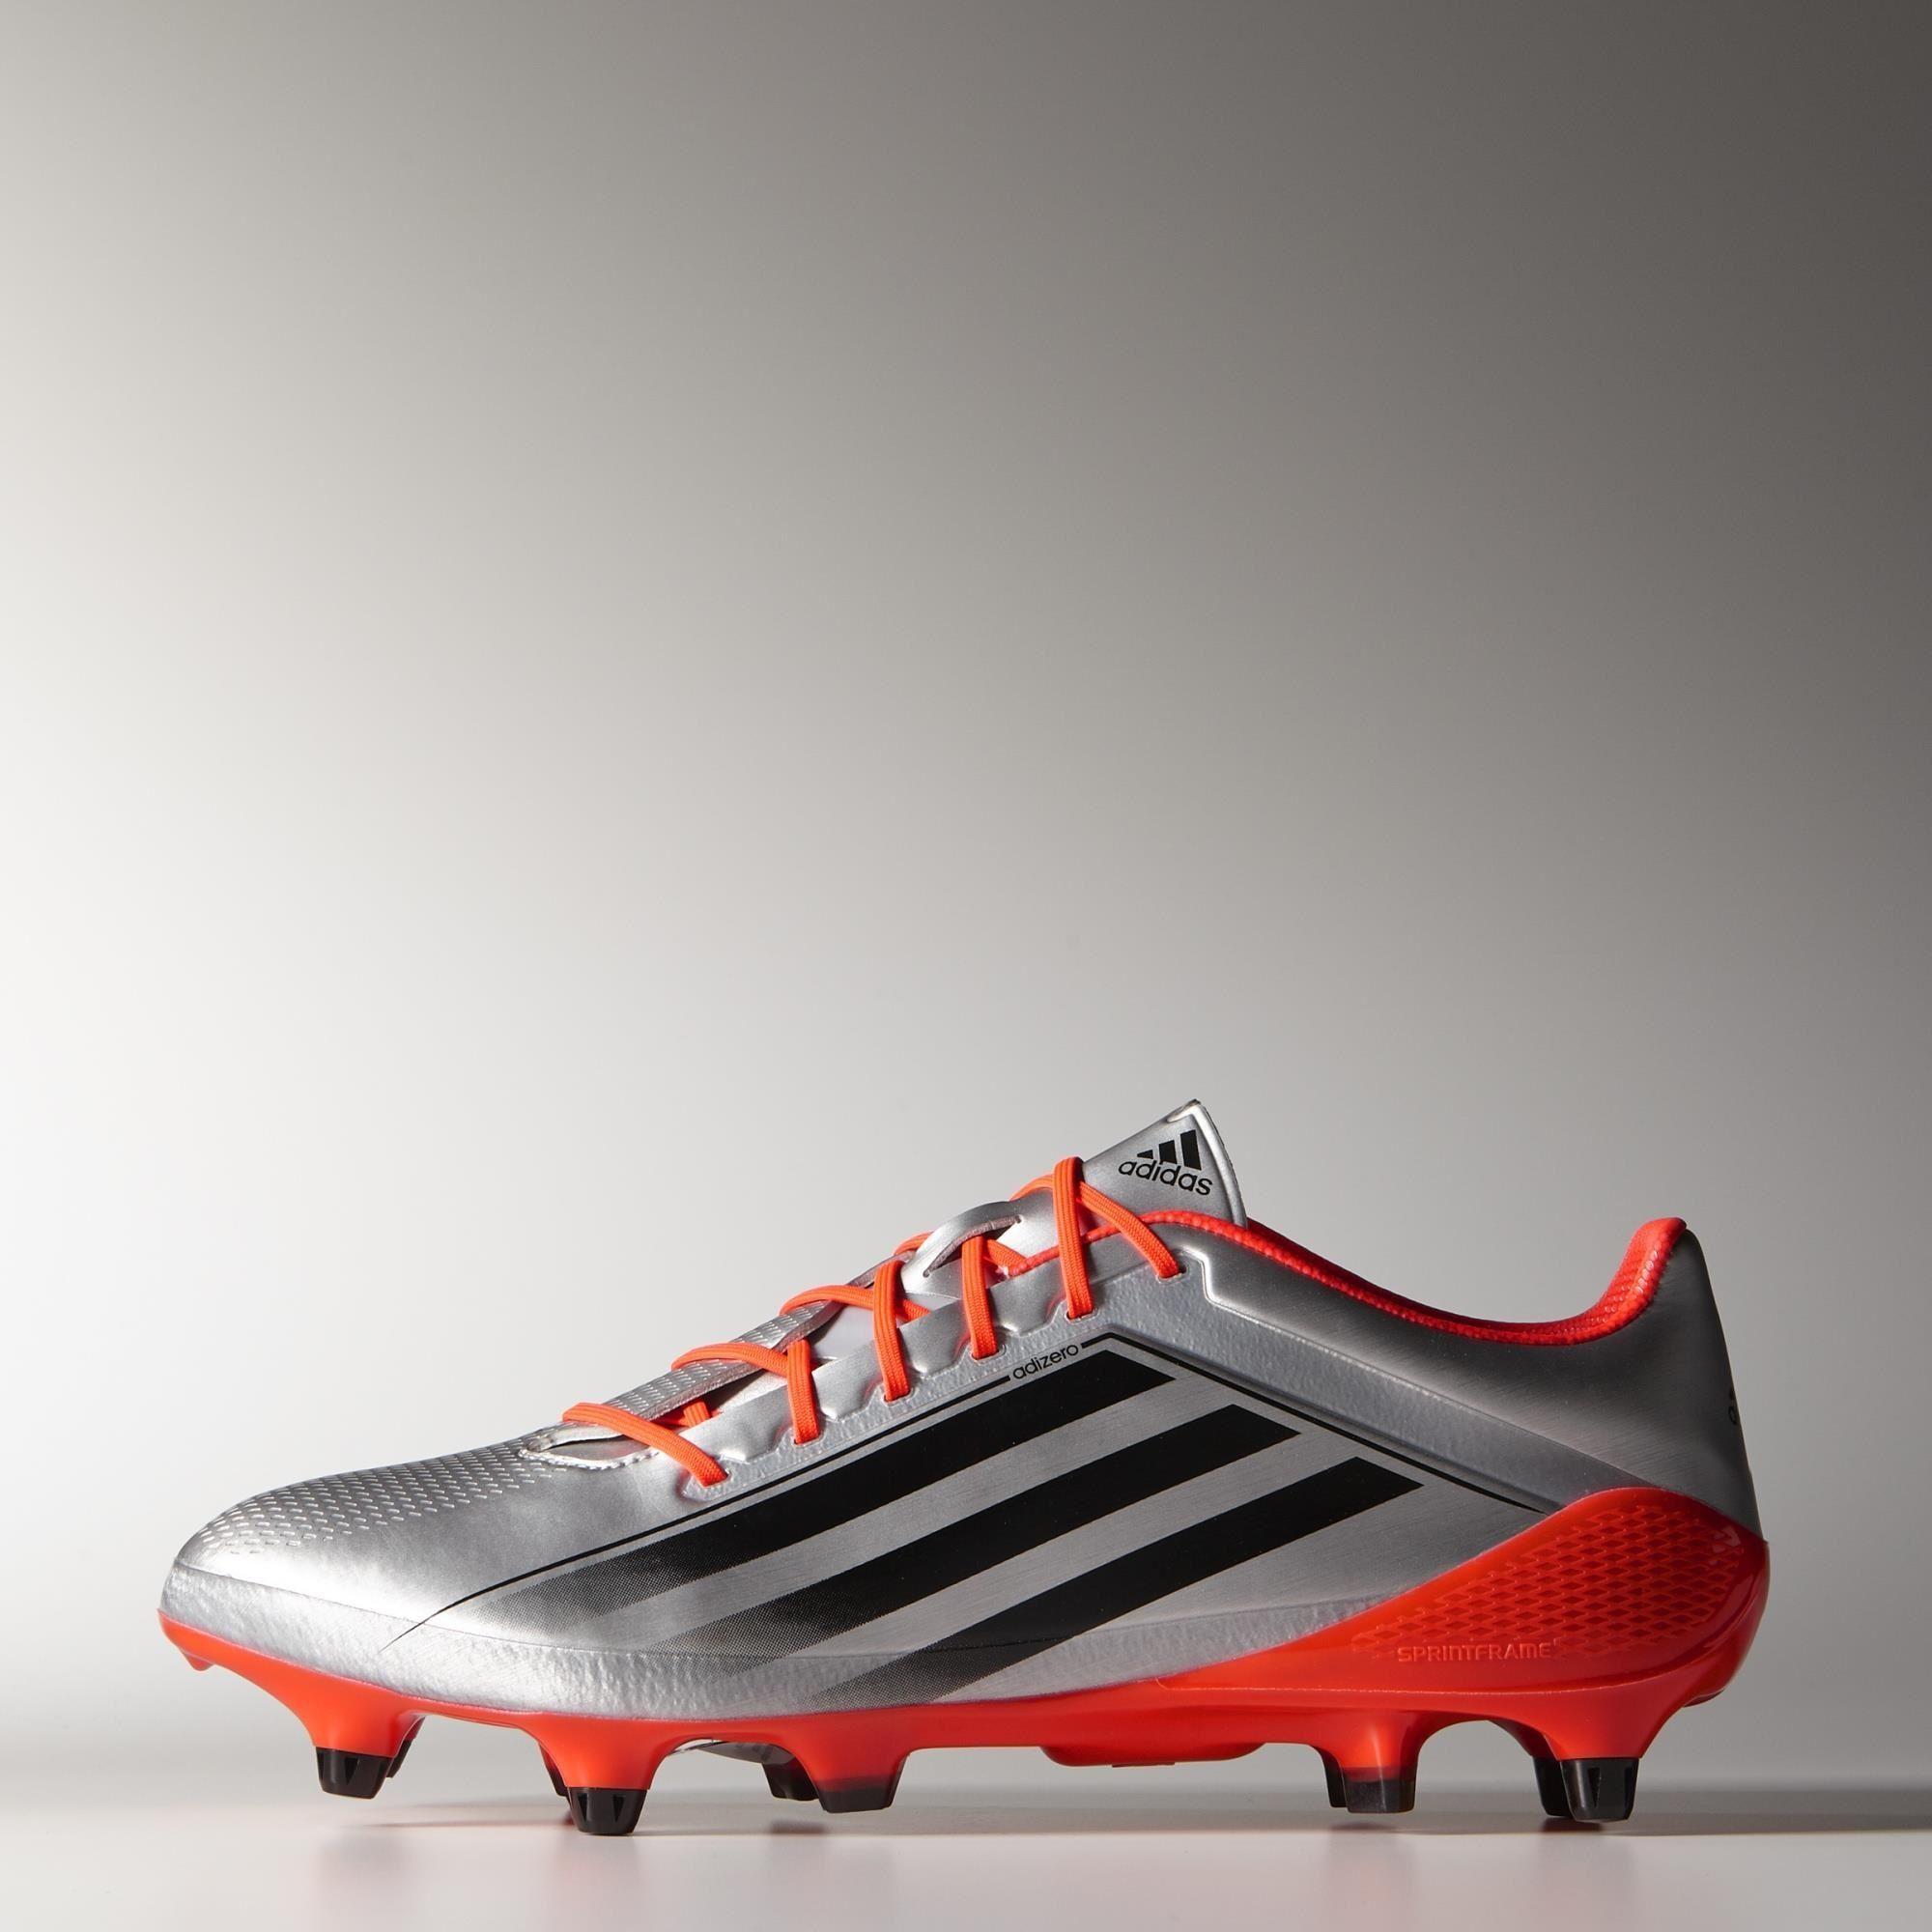 adidas adizero RS7 Pro 4.0 X-TRX SG - Silver | adidas New Zealand